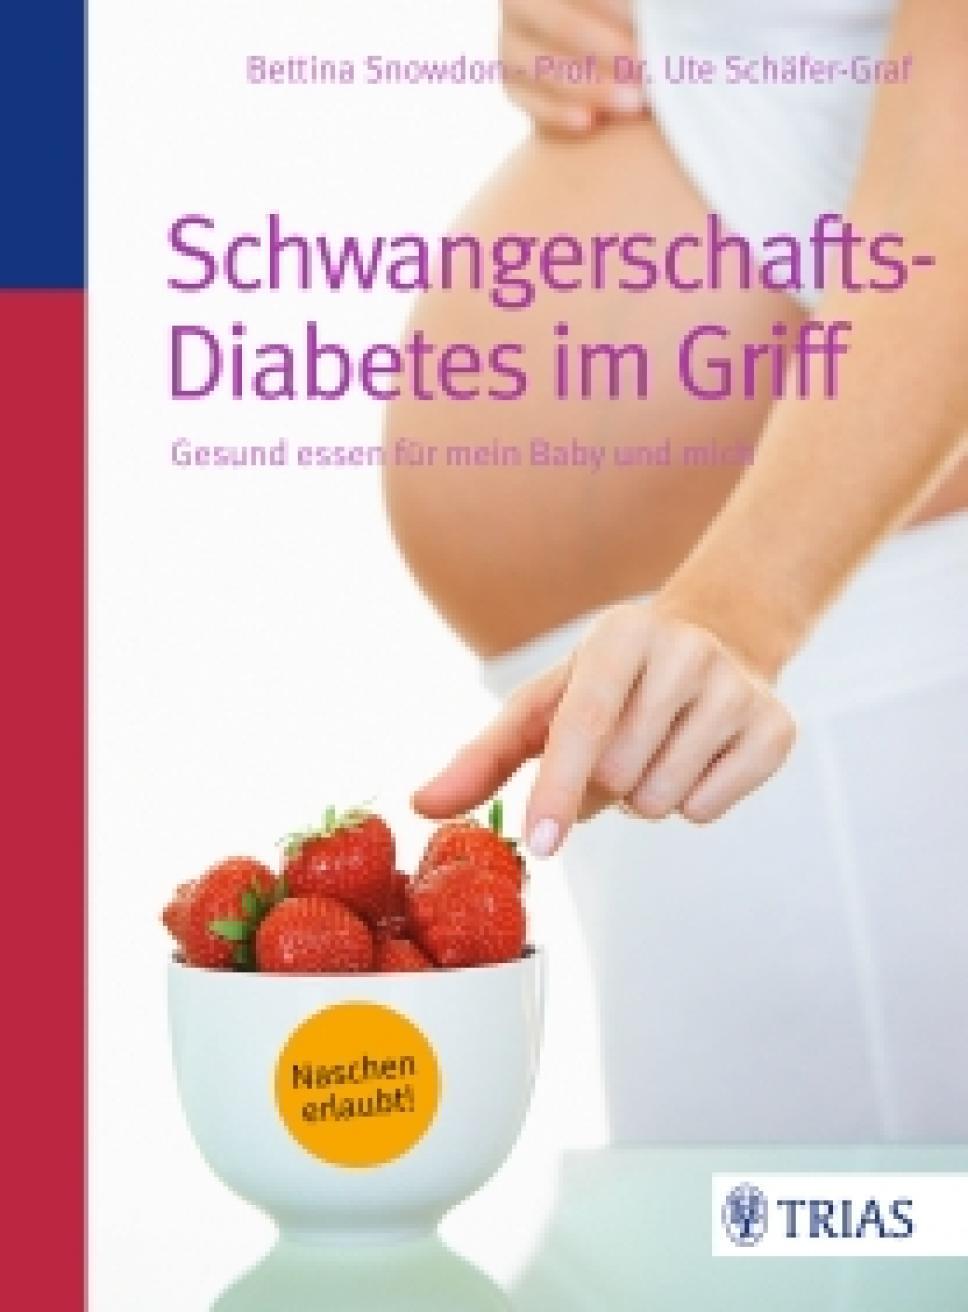 Schaefer-Graf Schwangerschaftsdiabetes im Griff